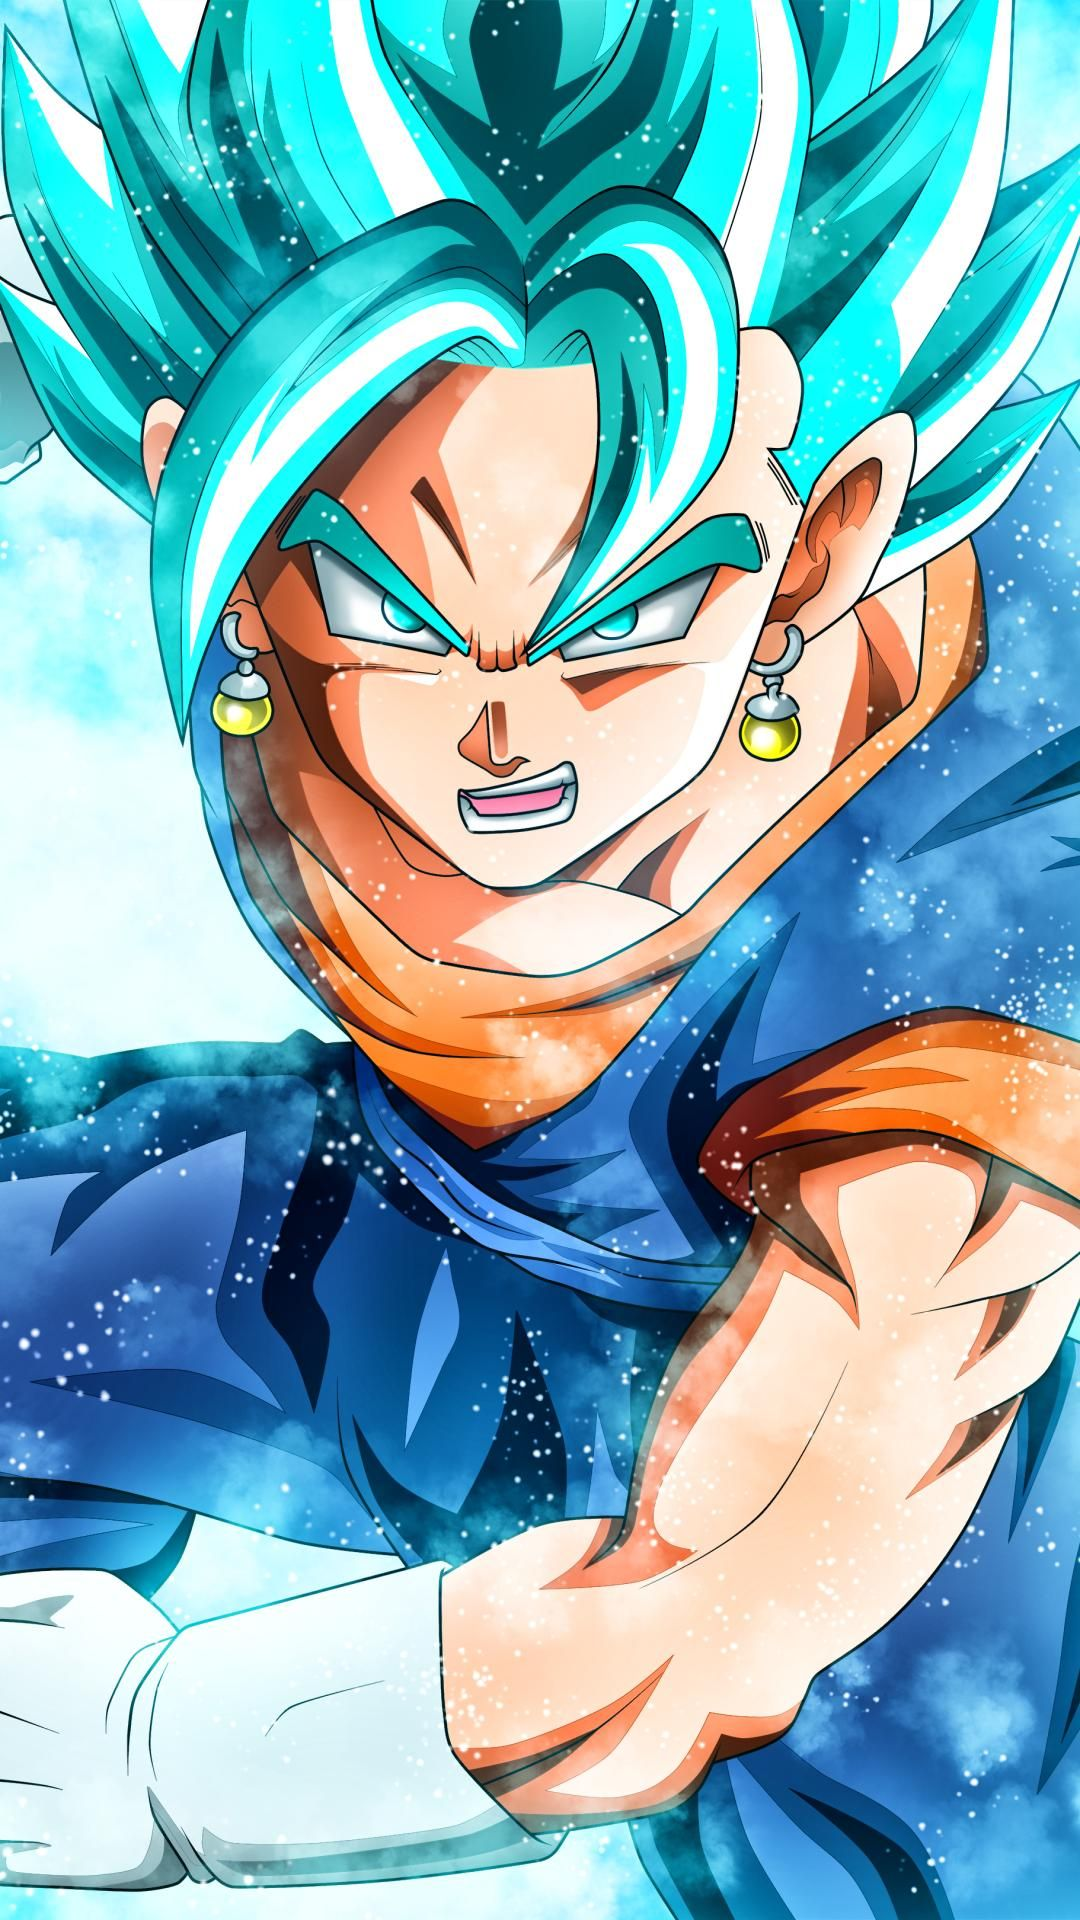 Hd Wallpaper 100 Anime Dragon Ball Super Anime Dragon Ball Dragon Ball Super Wallpapers